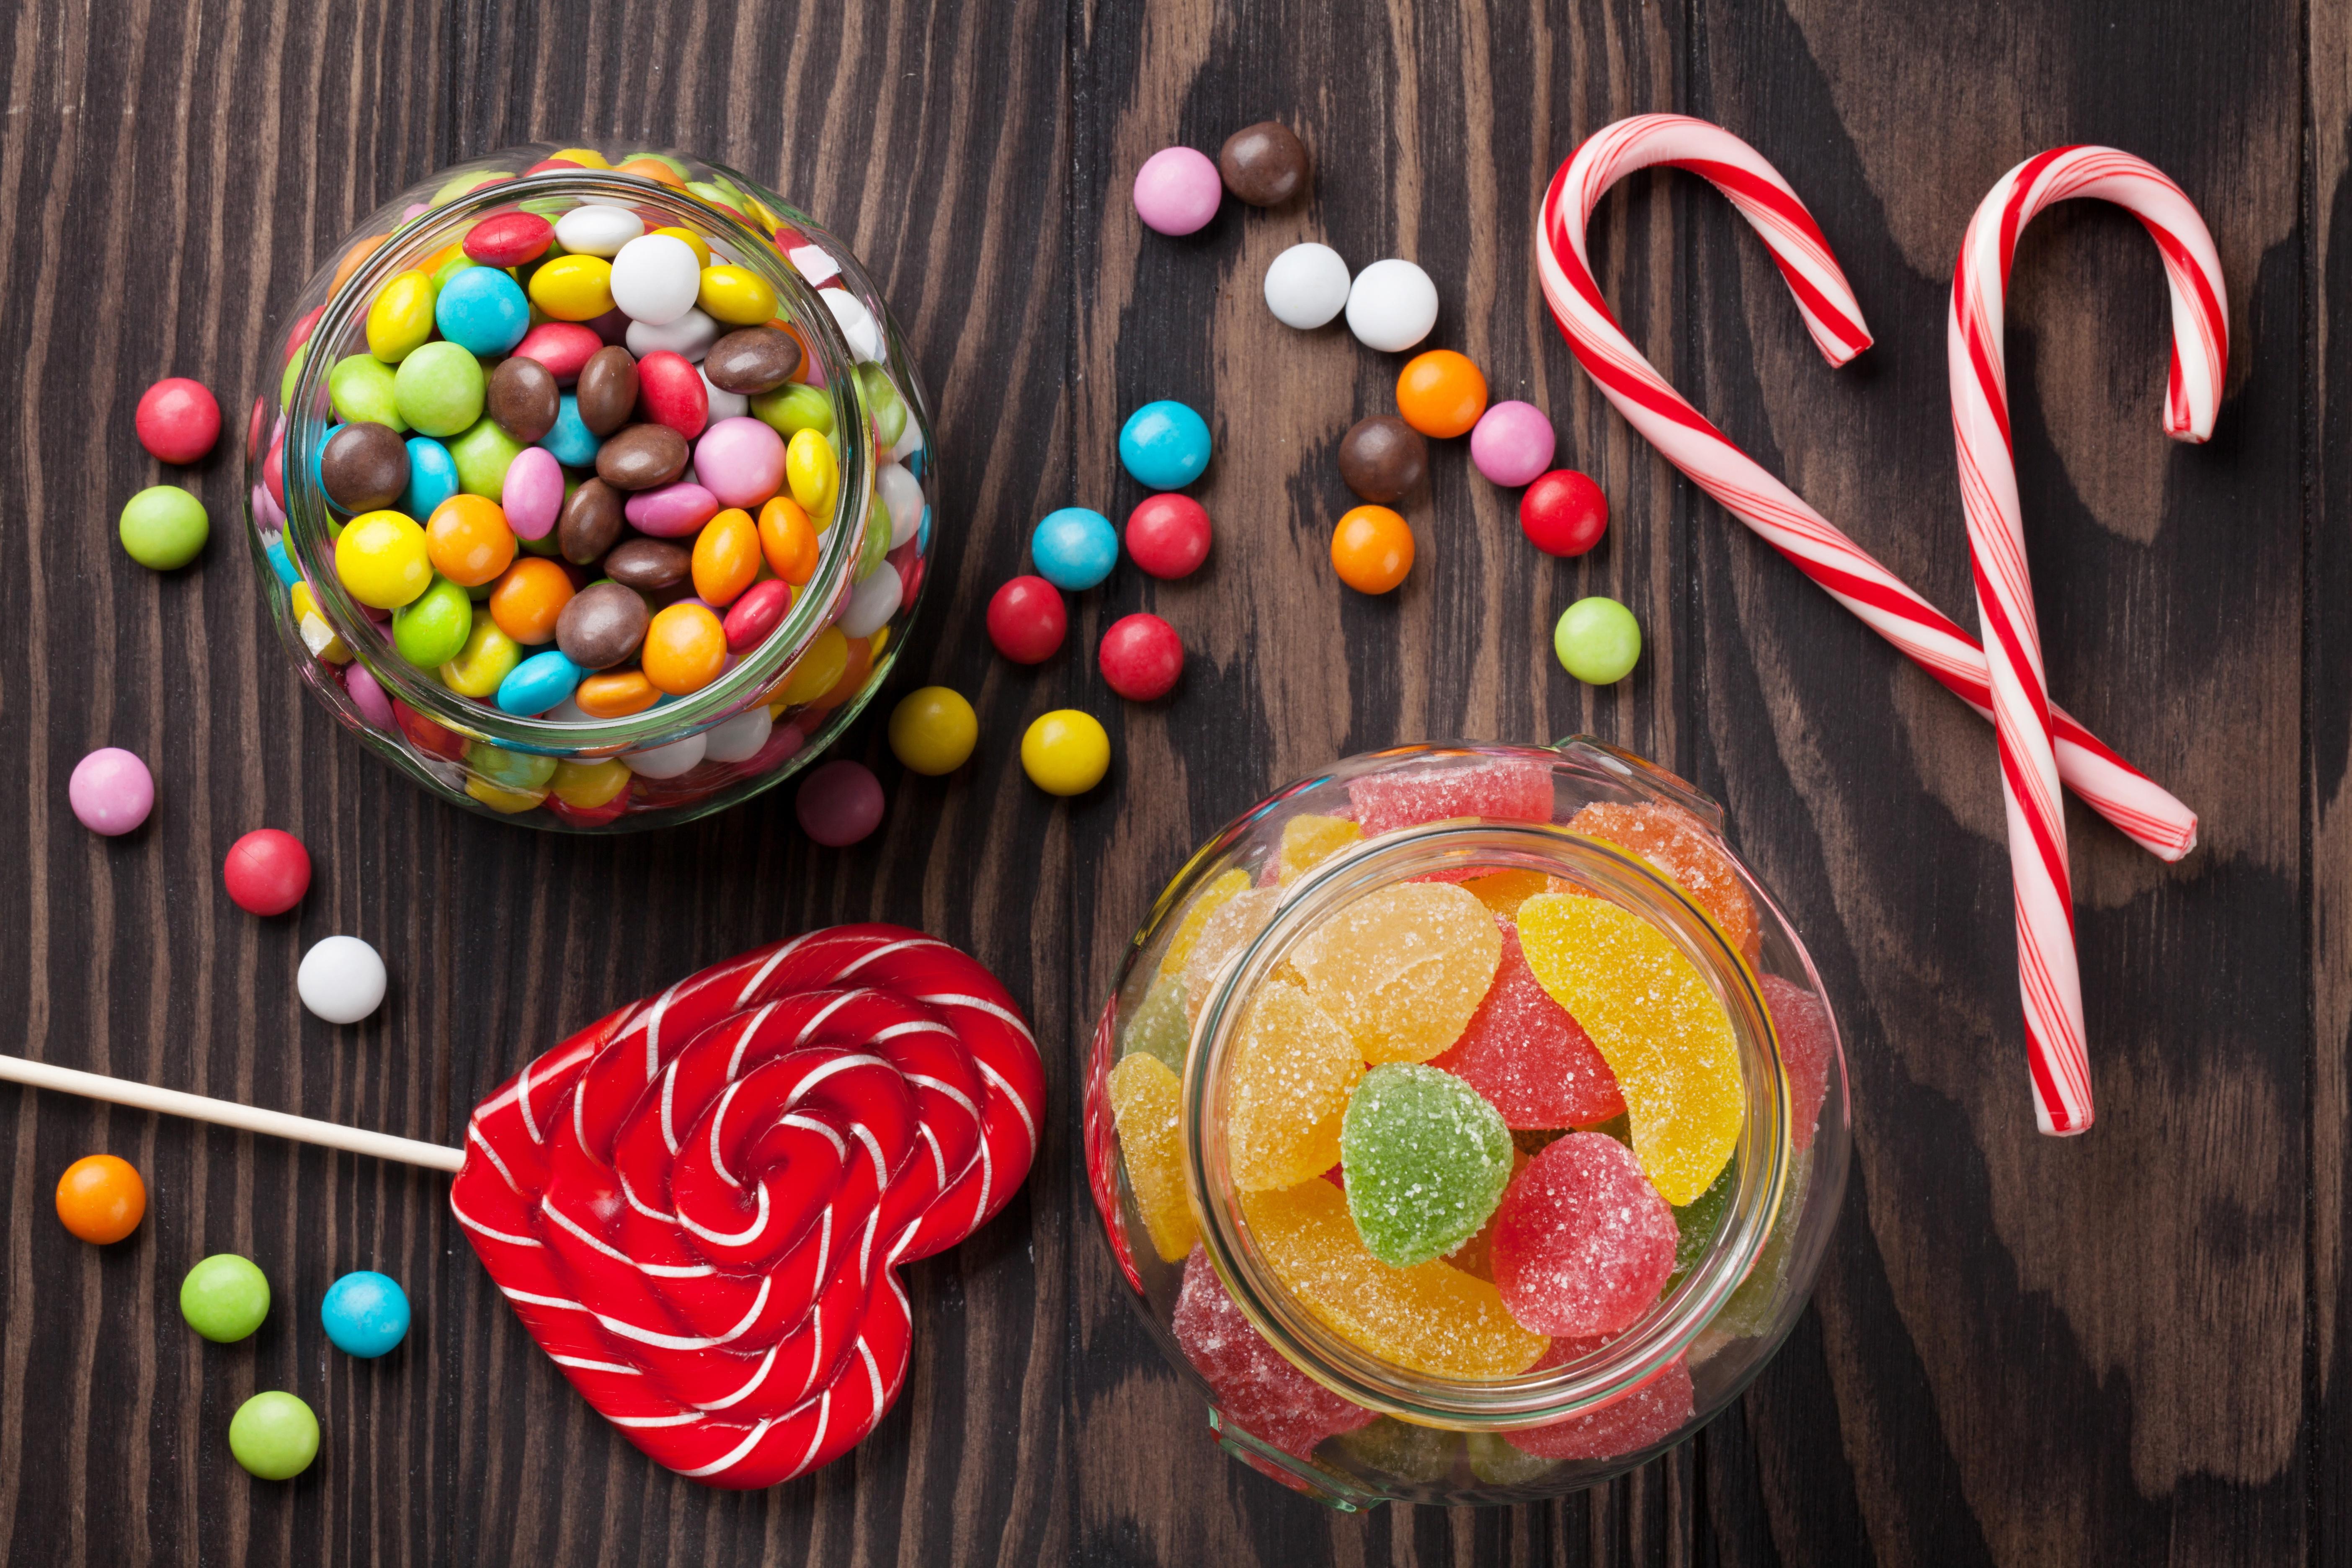 Крутые картинки с конфетами